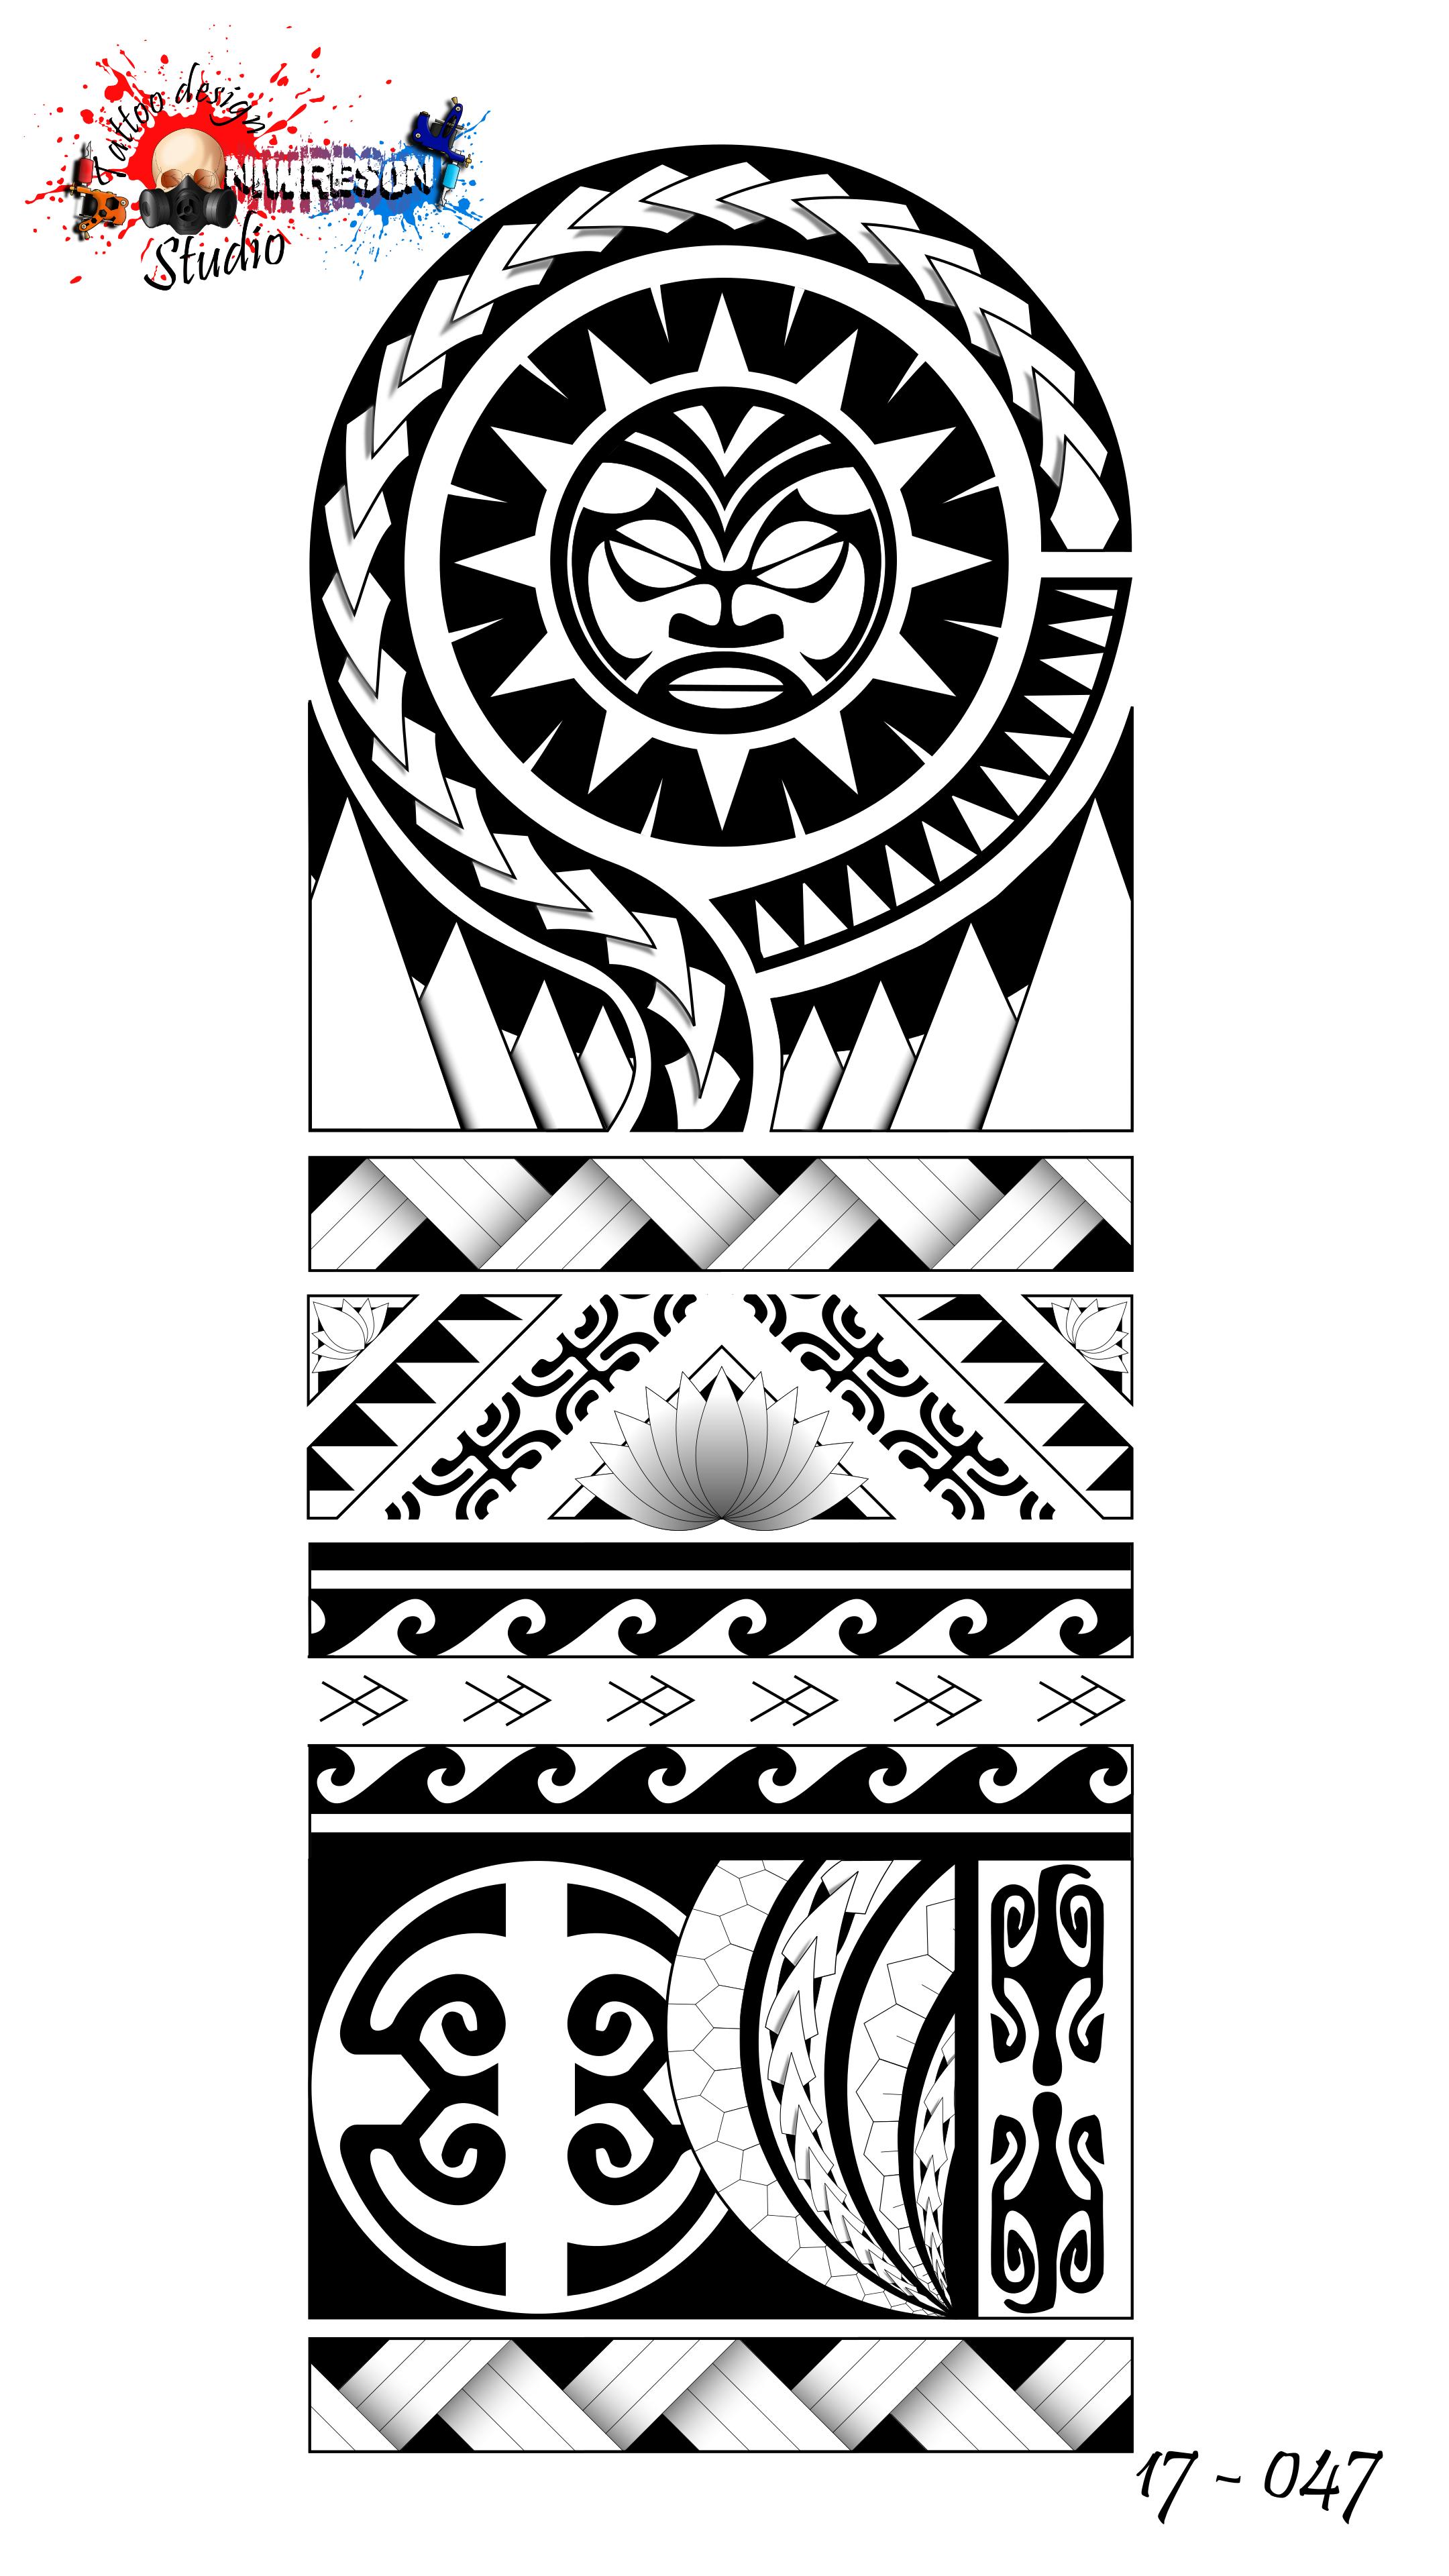 Pin De Alexander Duarte Em Maori Tatuagem Maori Tatuagem Maori